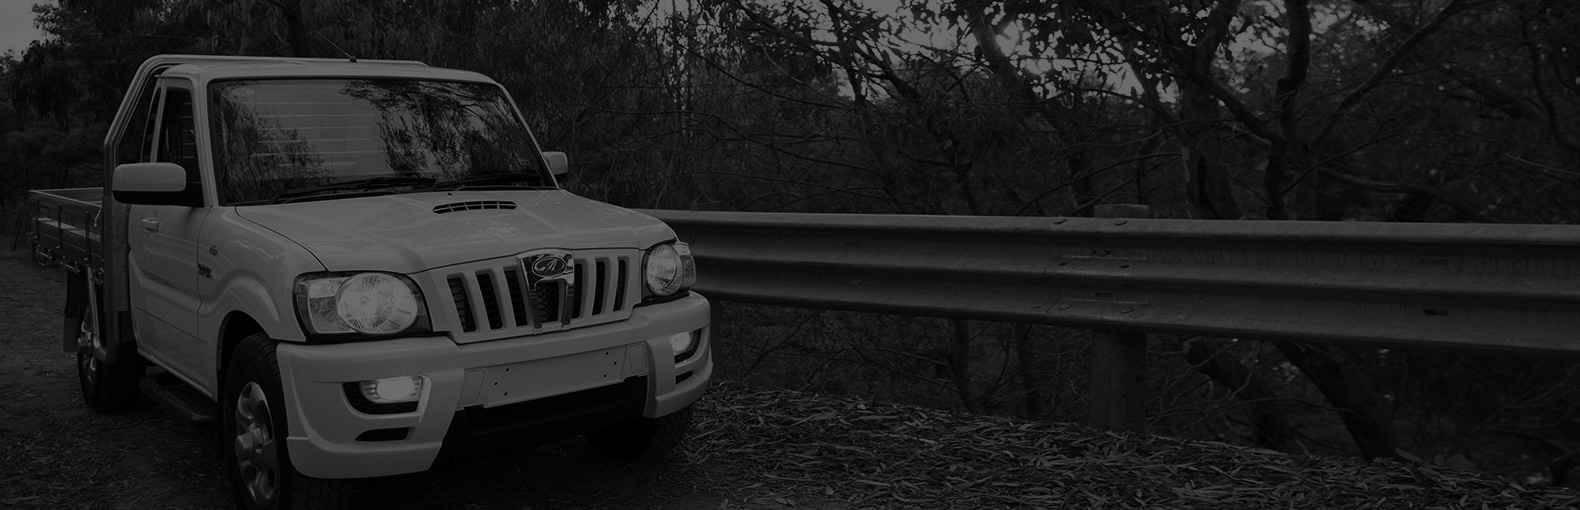 My Mahindra Pik-Up featuring Matthew HaydenEaton Locking Differential